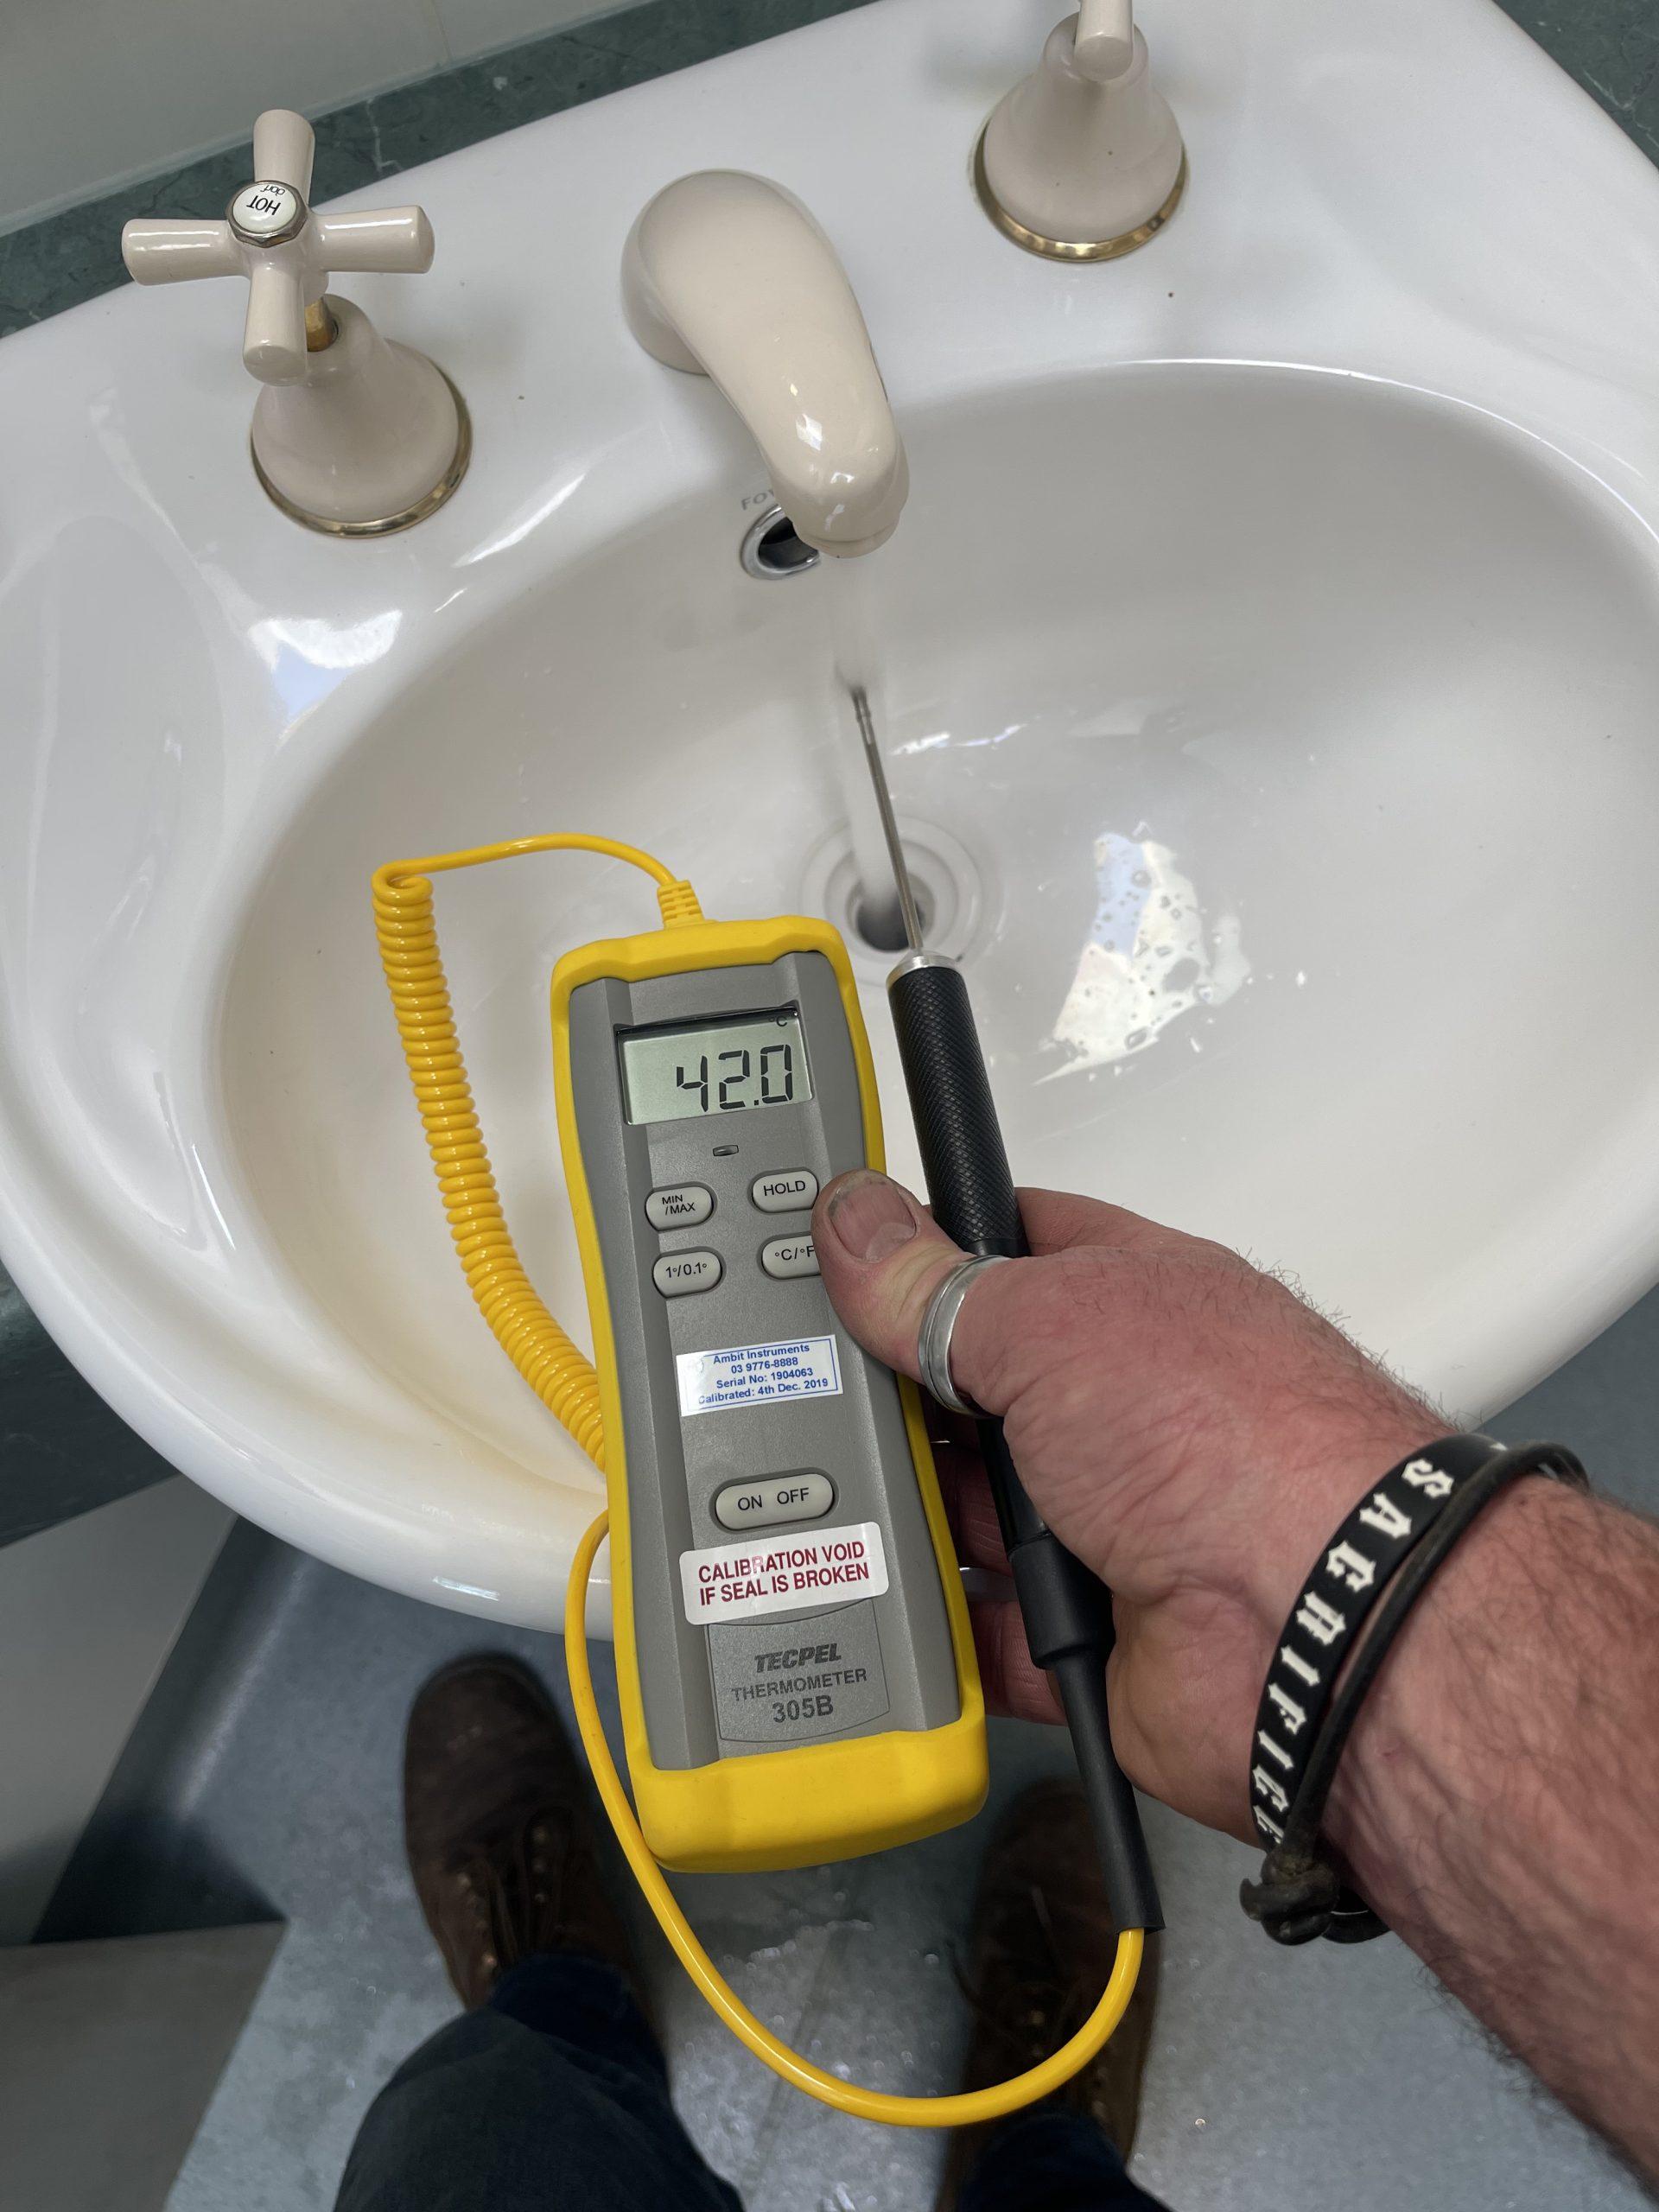 Thermostatic Mixing Valves   Tomlinson Plumbing   Geelong   Torquay   Ocean Grove   Barwon Heads